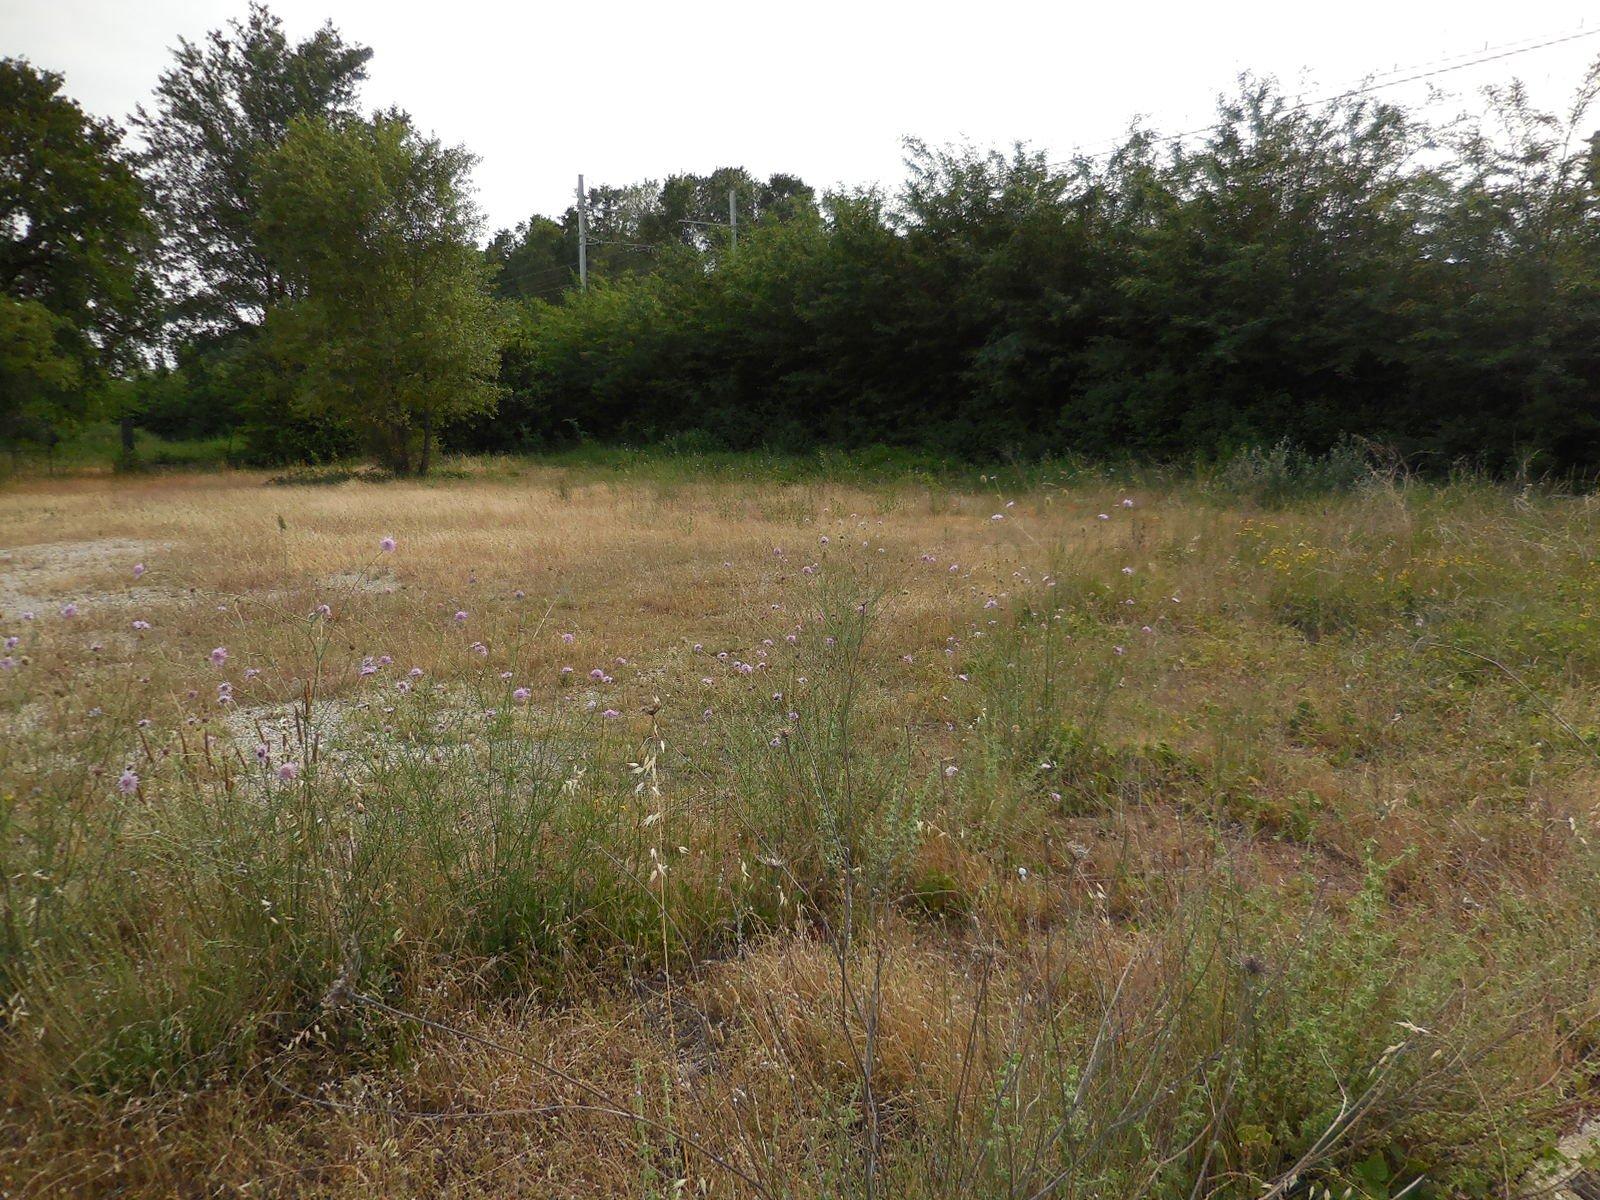 Vente Terrain constructible - Savasse